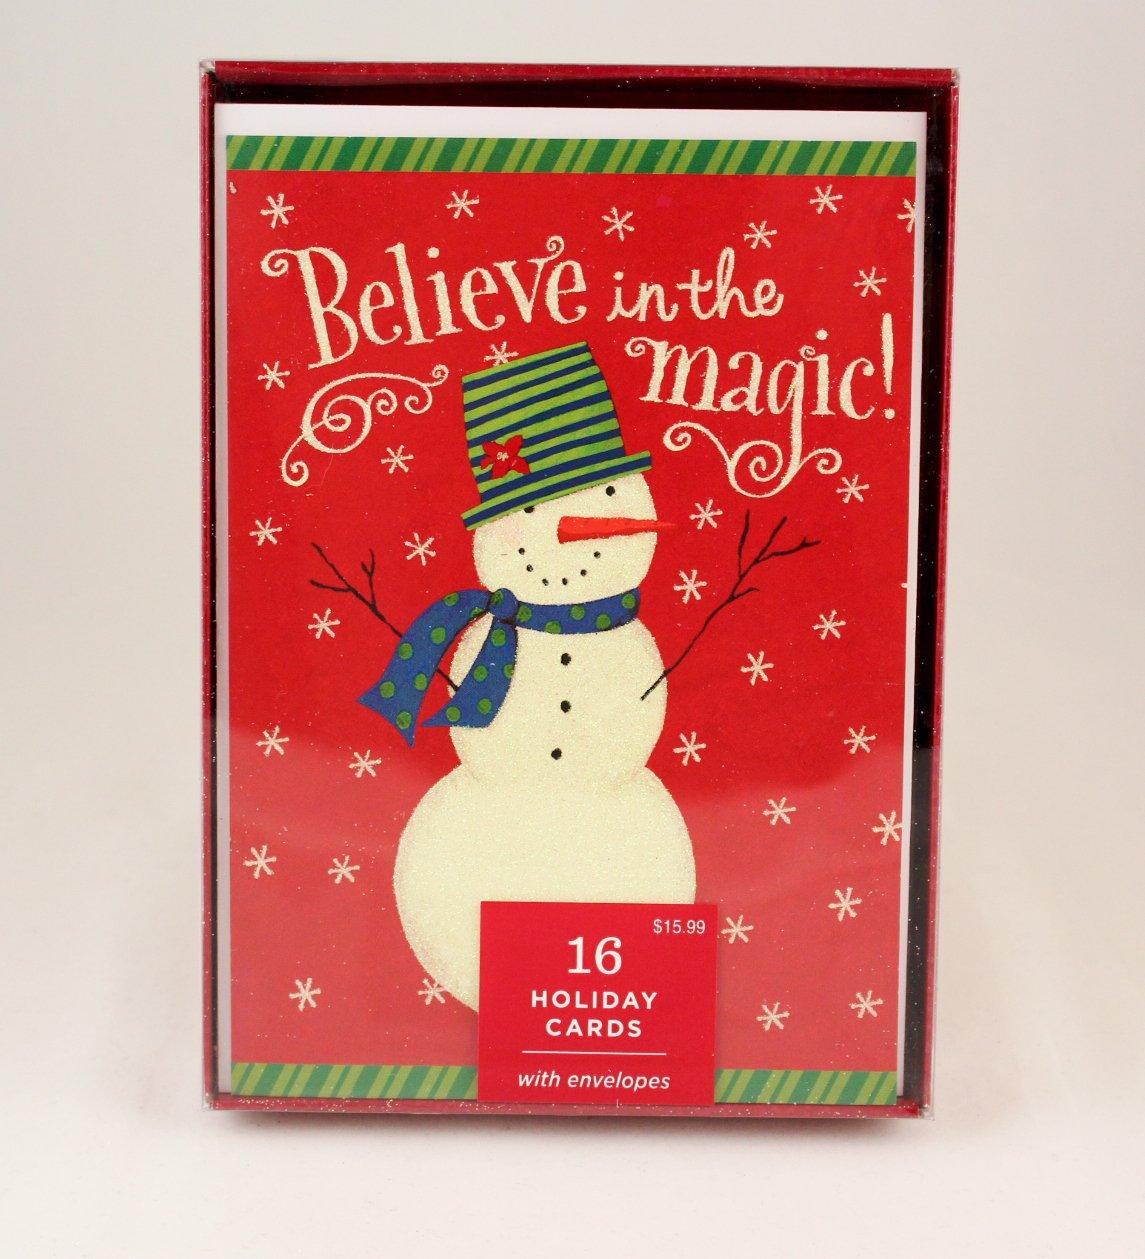 Amazon.com : Hallmark Dayspring Holiday Christmas Cards - Believe in ...